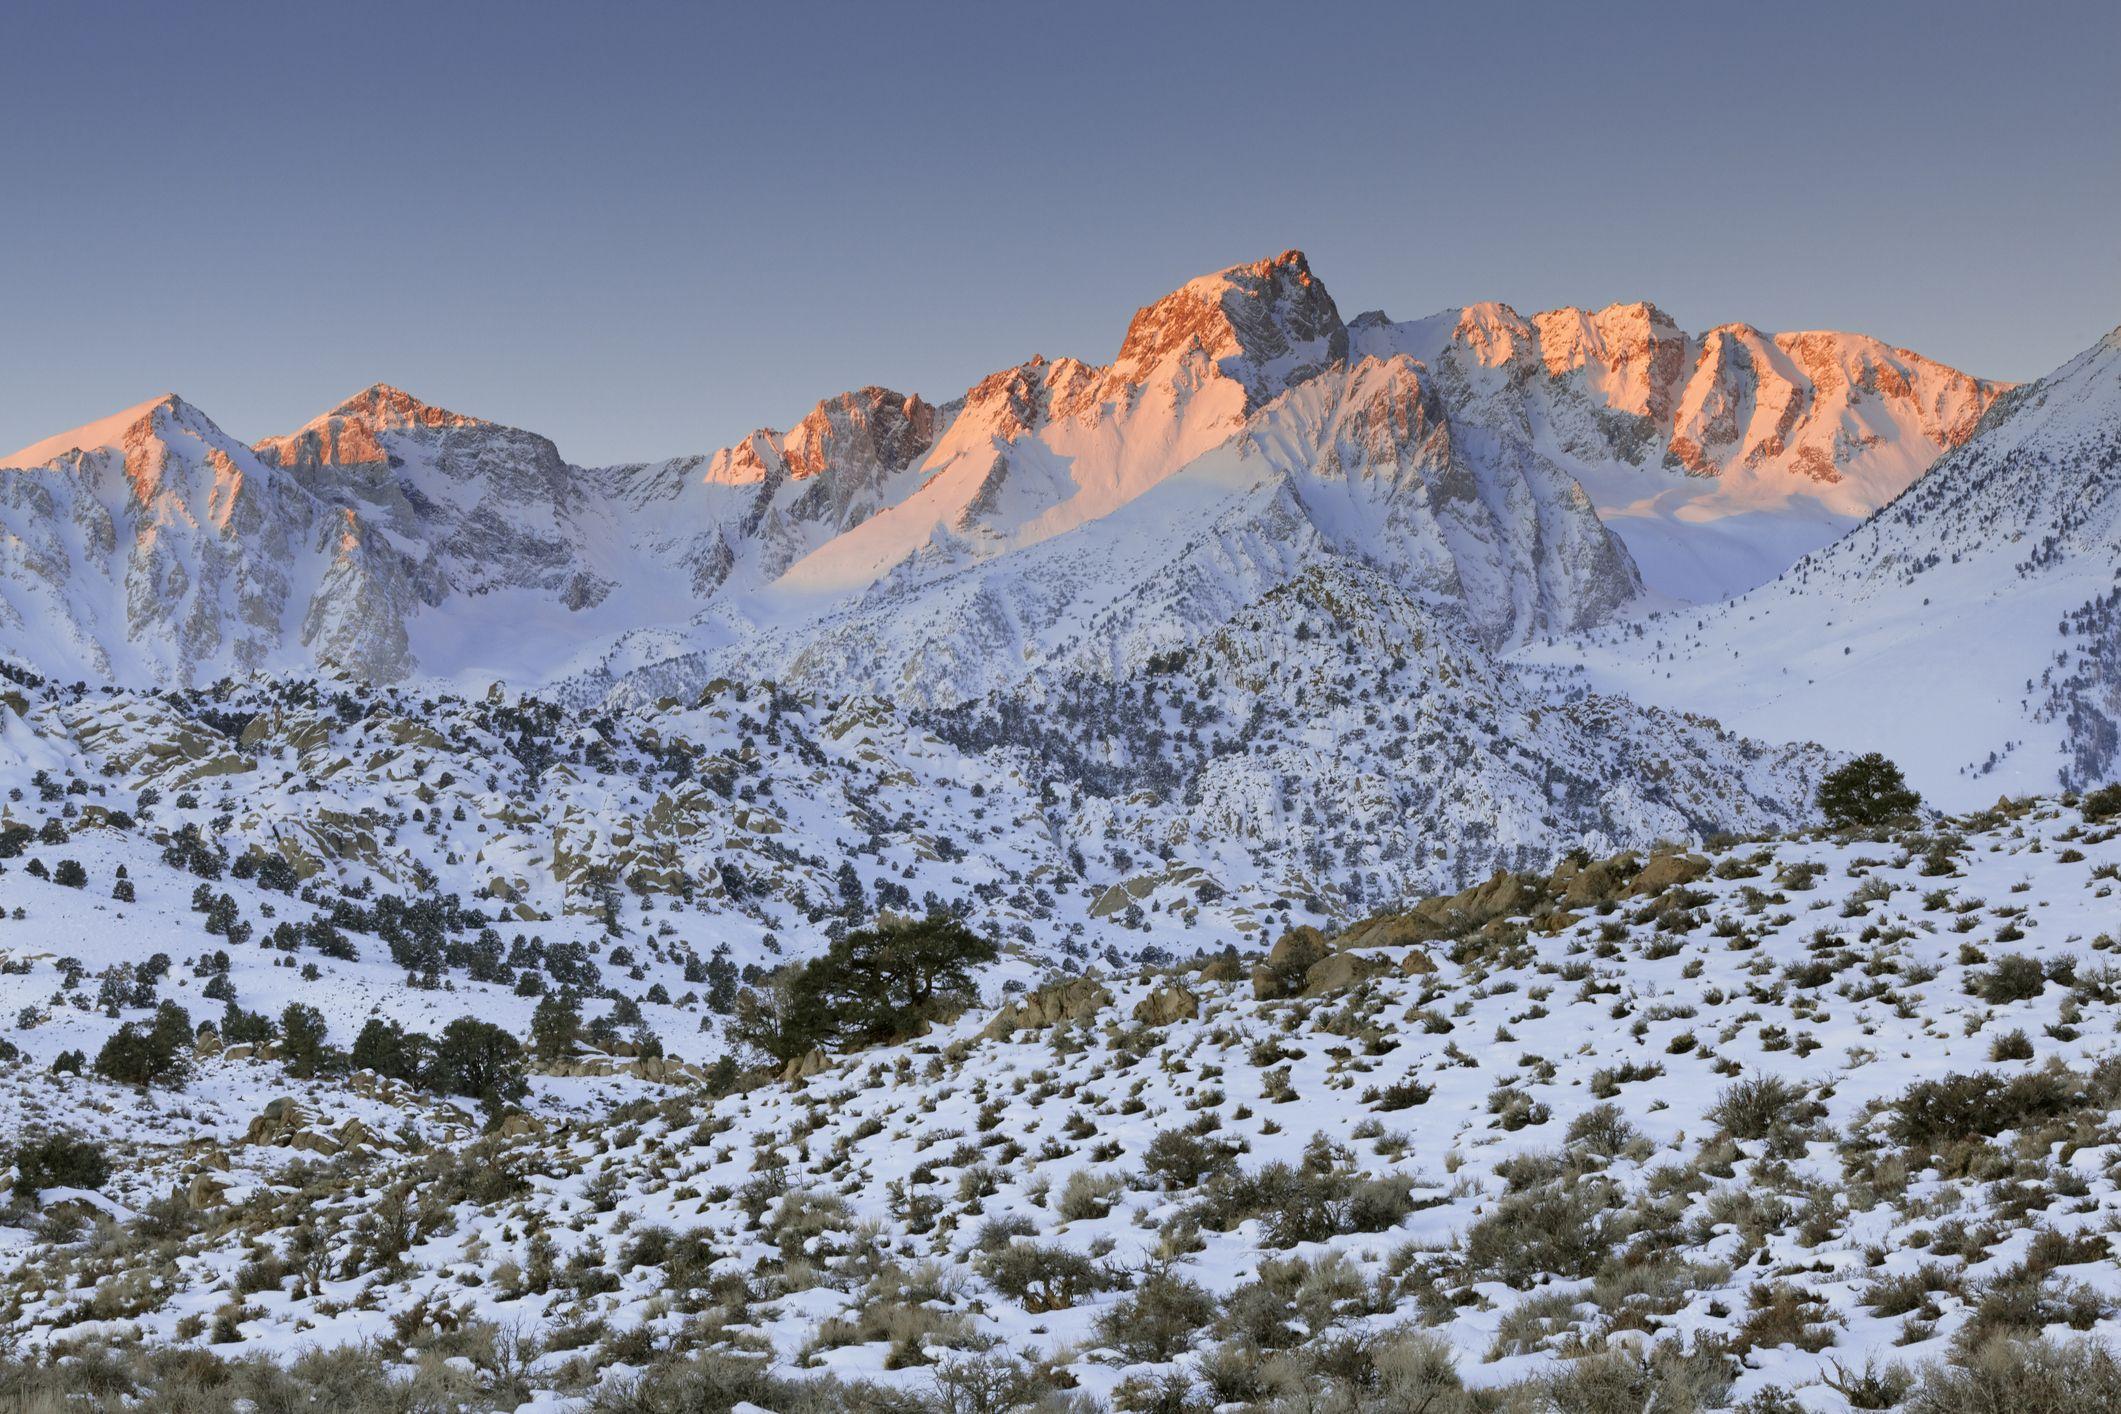 California Drought Made The Sierra Nevada Mountains Rise An Inch